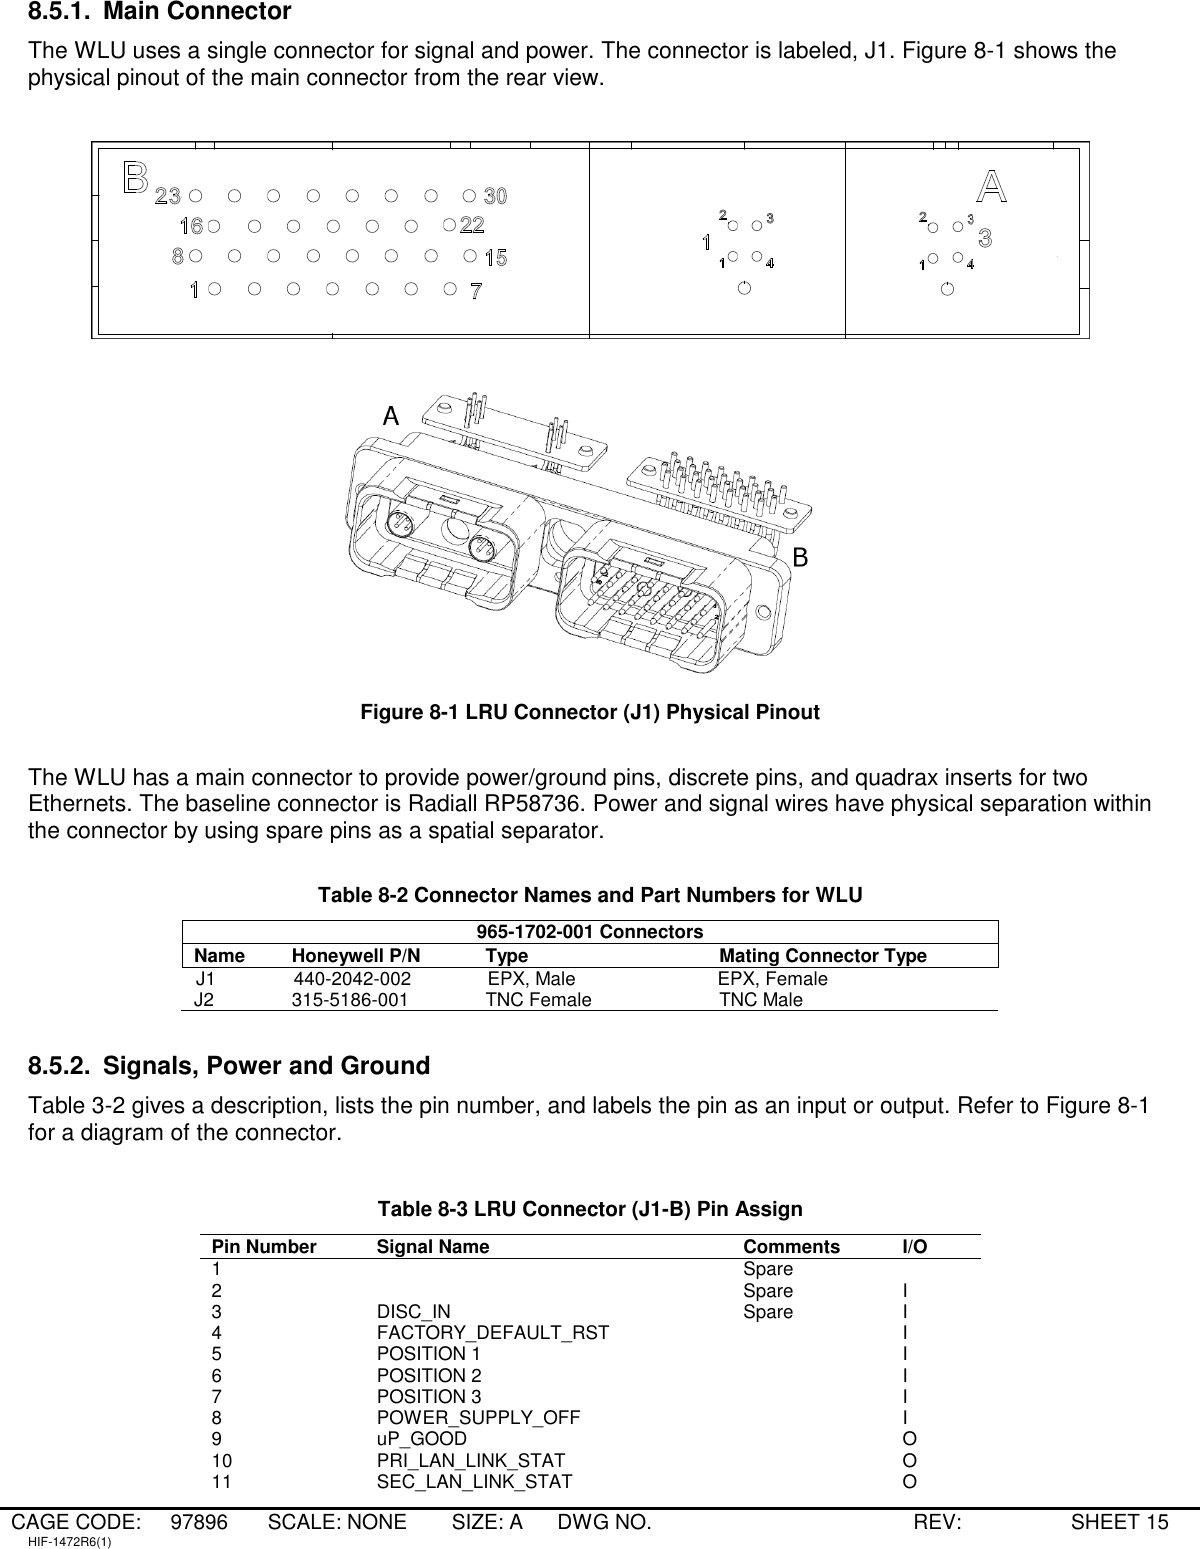 A Frame Male 7 Pin Plug Manual Guide